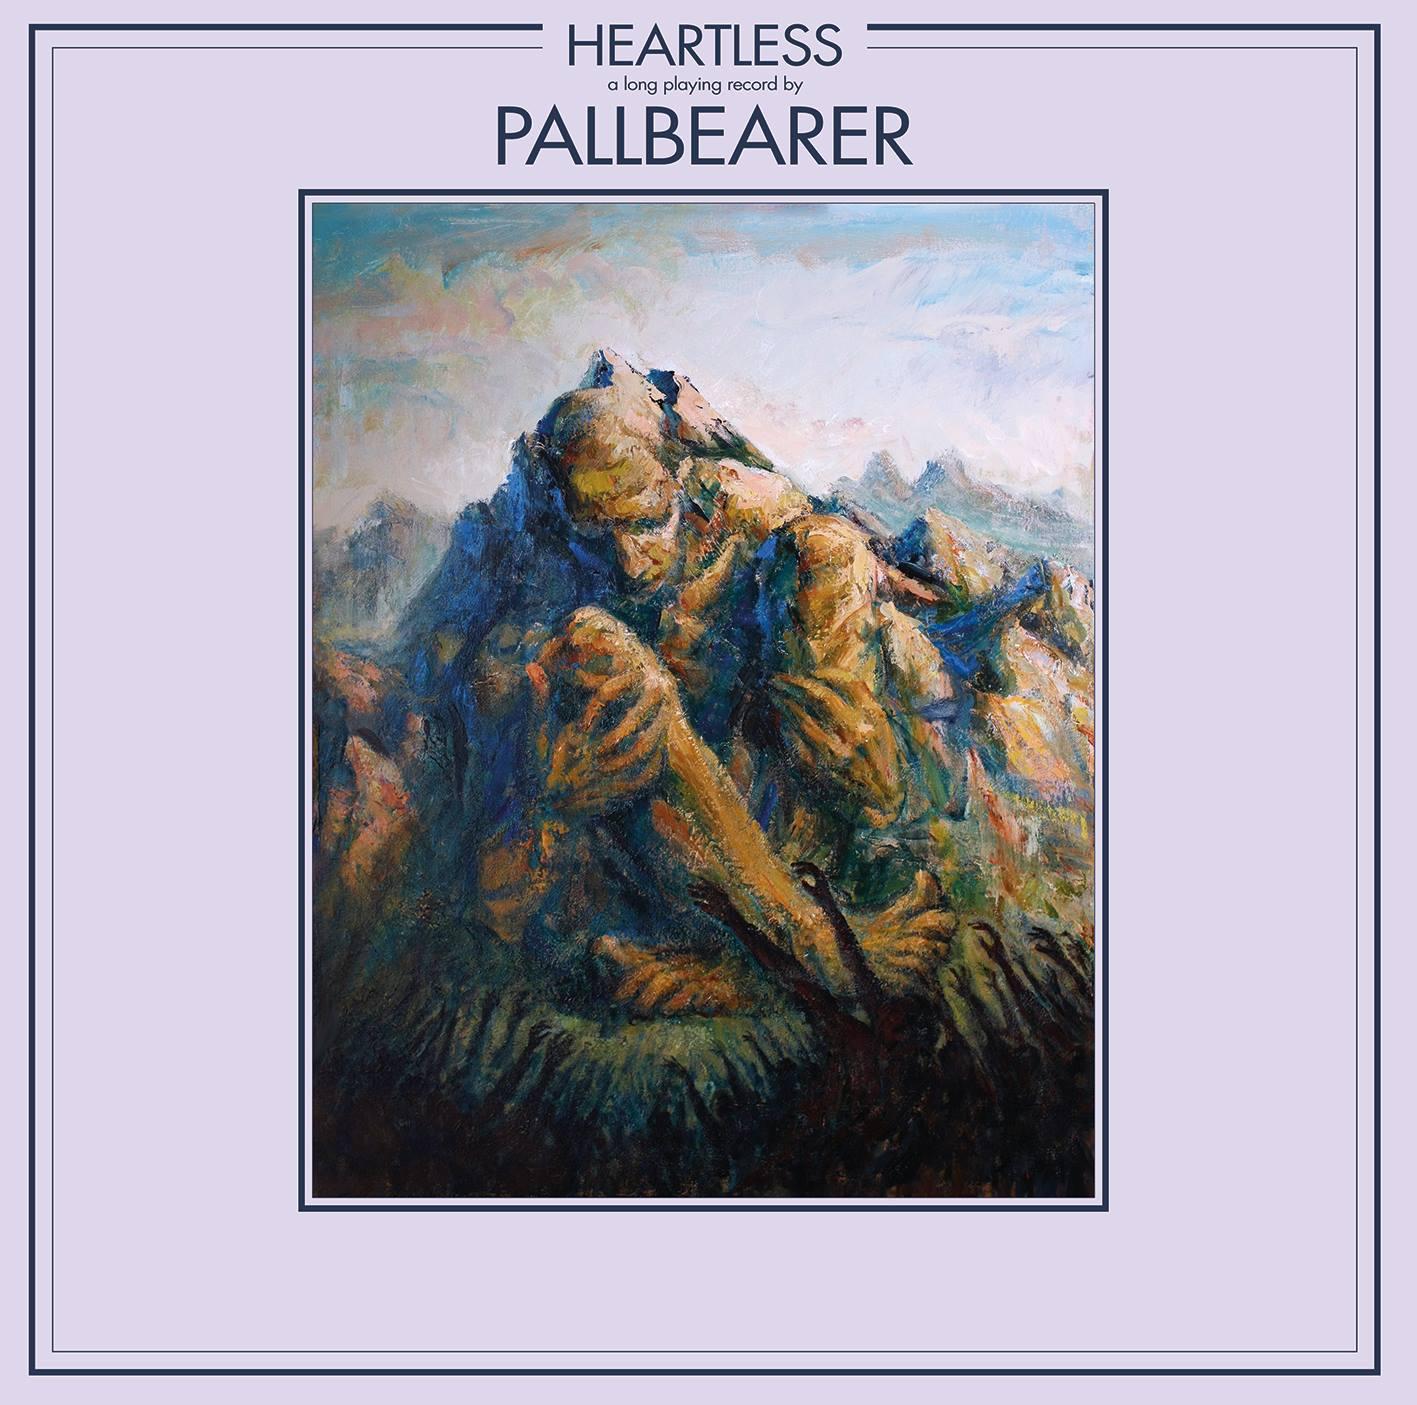 pallbearer heartless album Top 50 Albums of 2017